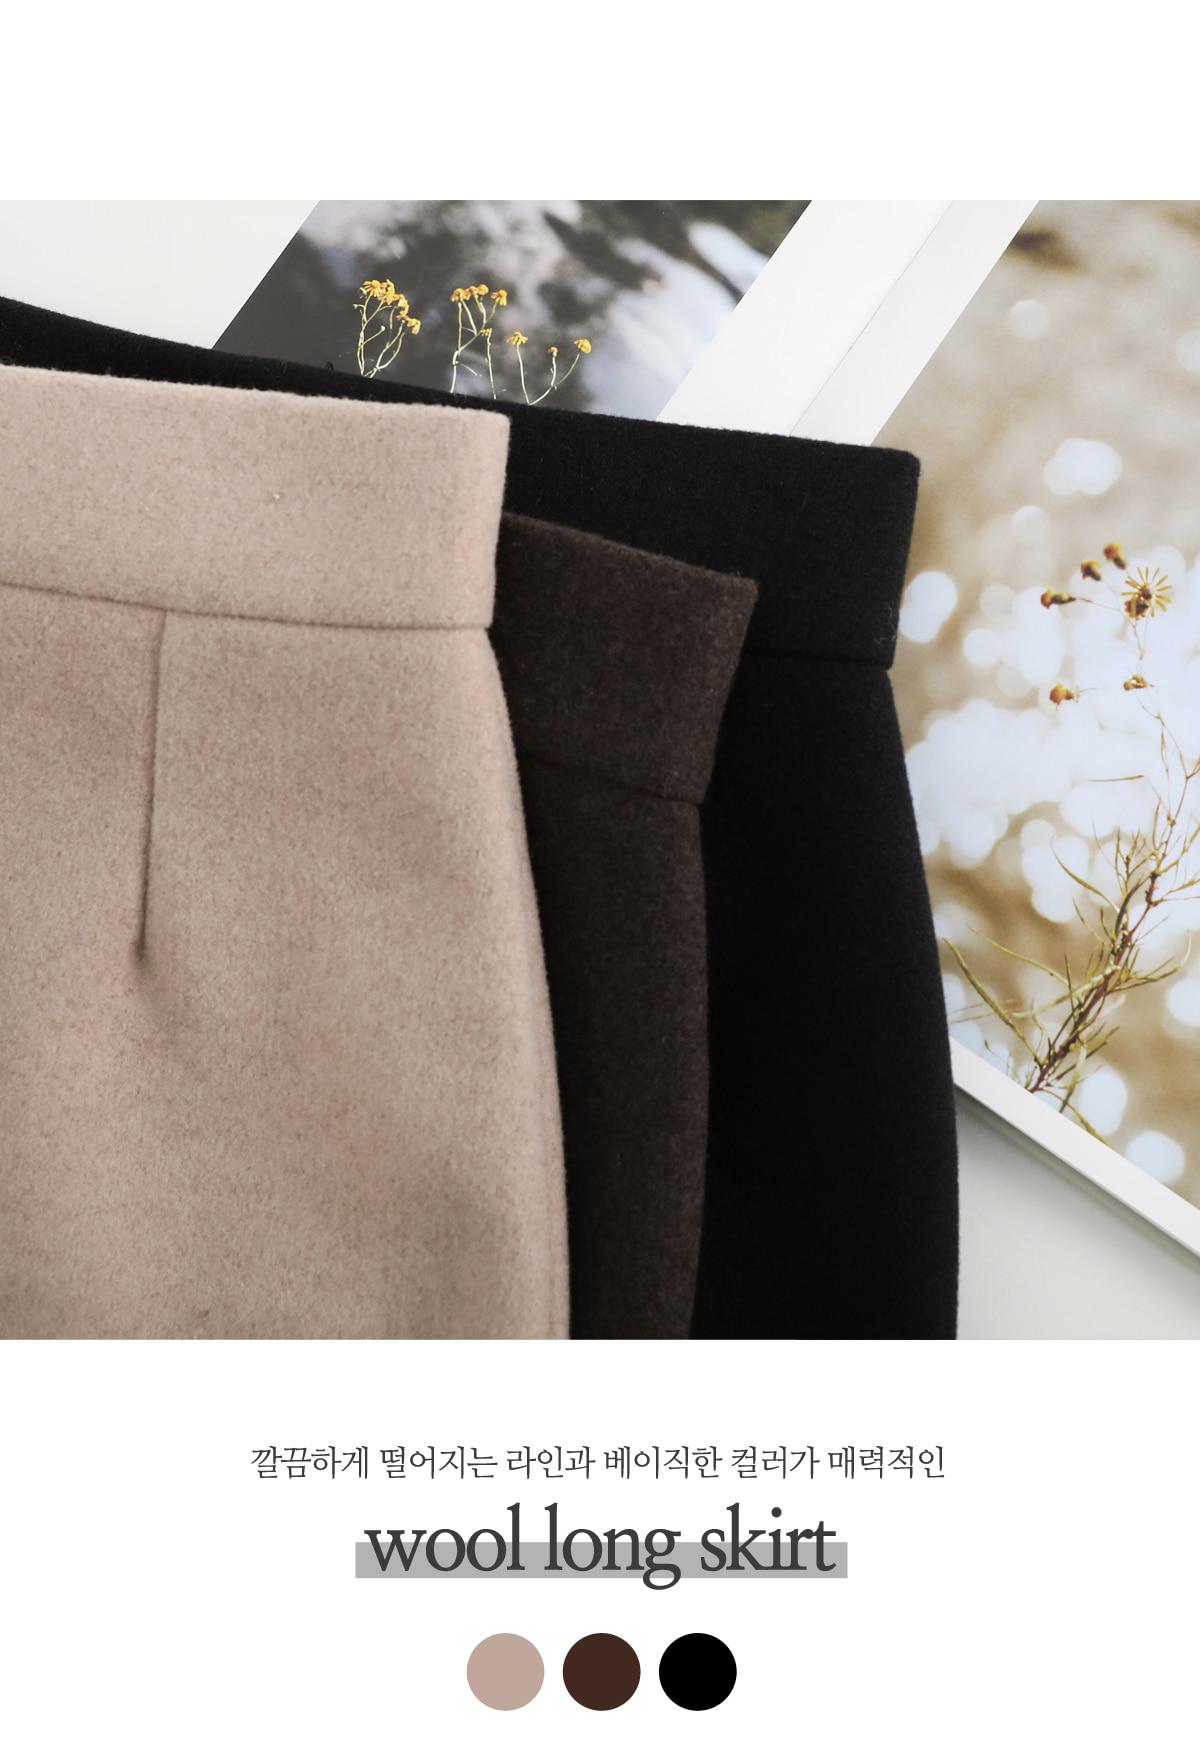 ON & On Woolong Skirt